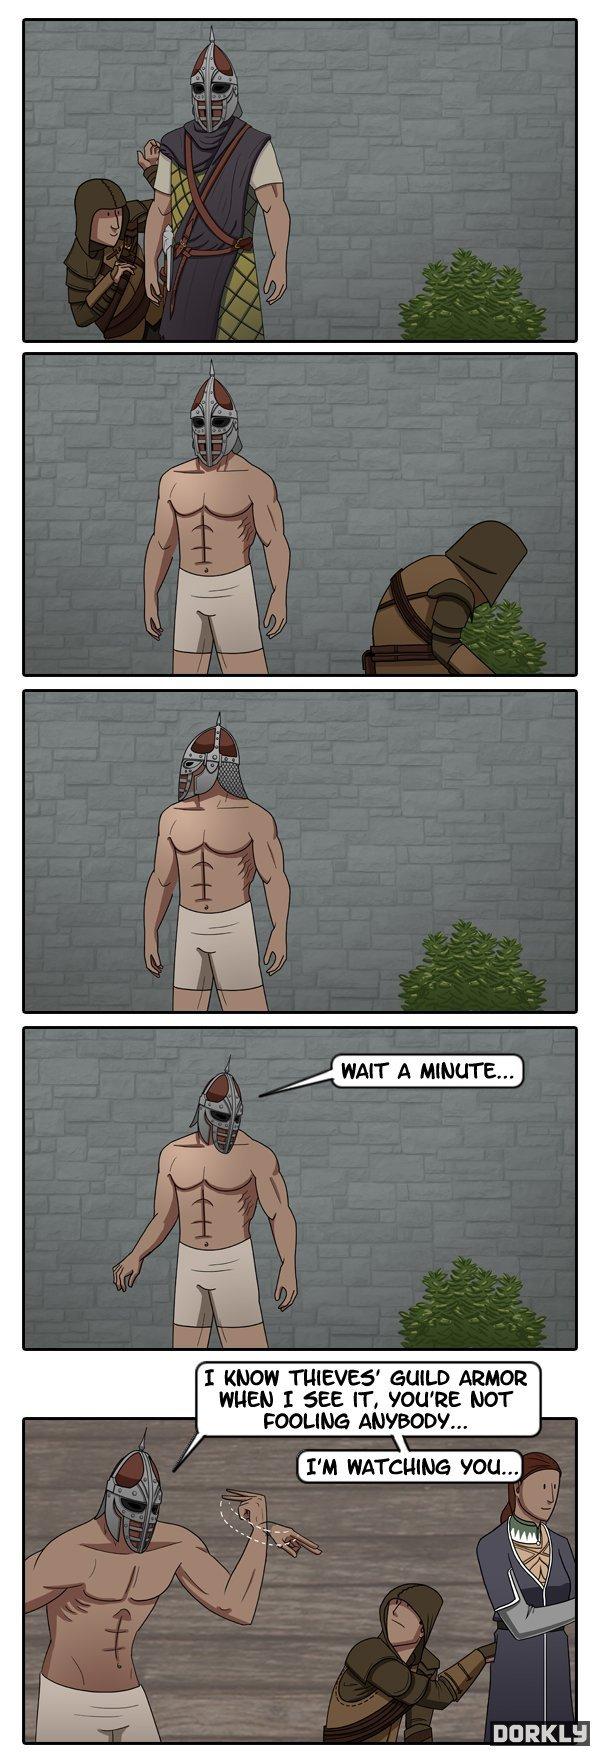 To Catch a Skyrim Thief. from Dorkly. rti' MIE